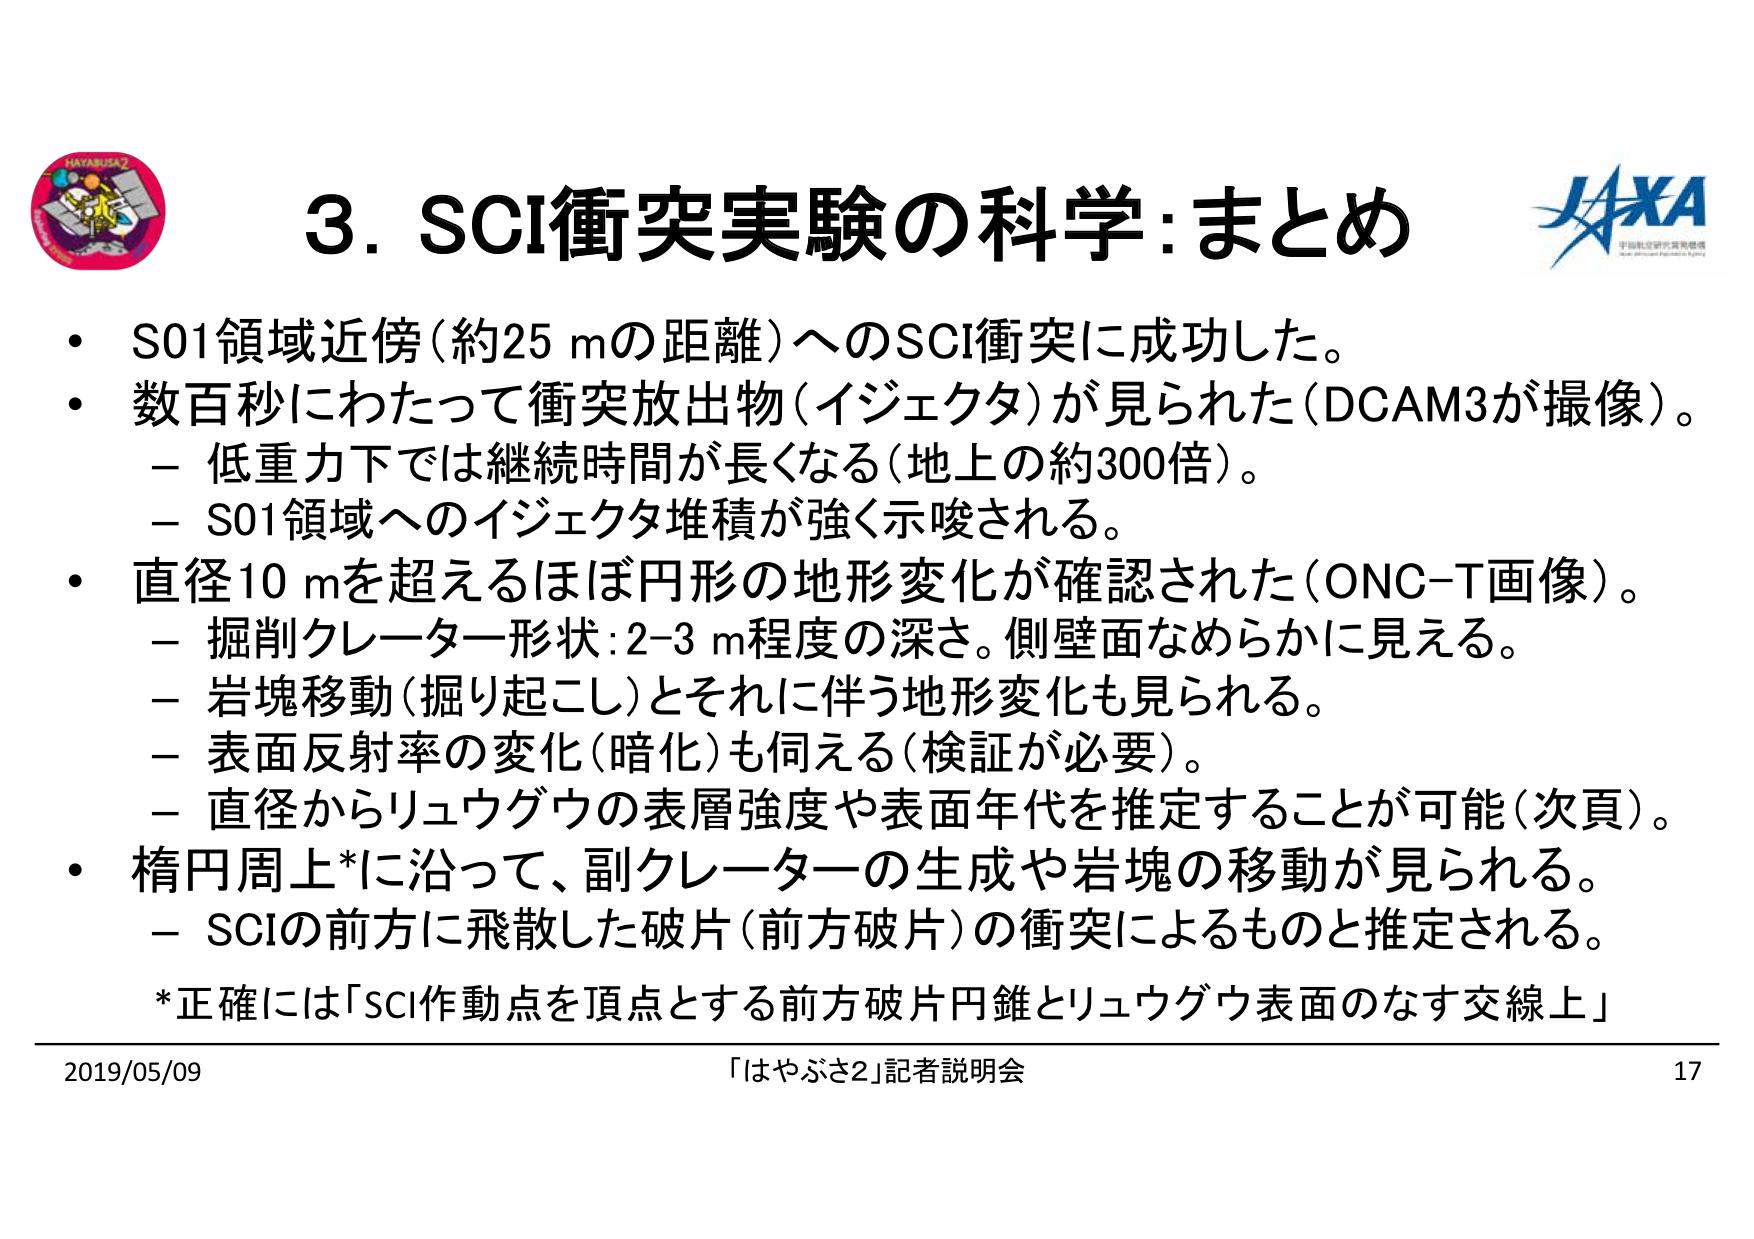 f:id:Imamura:20190509154413p:plain